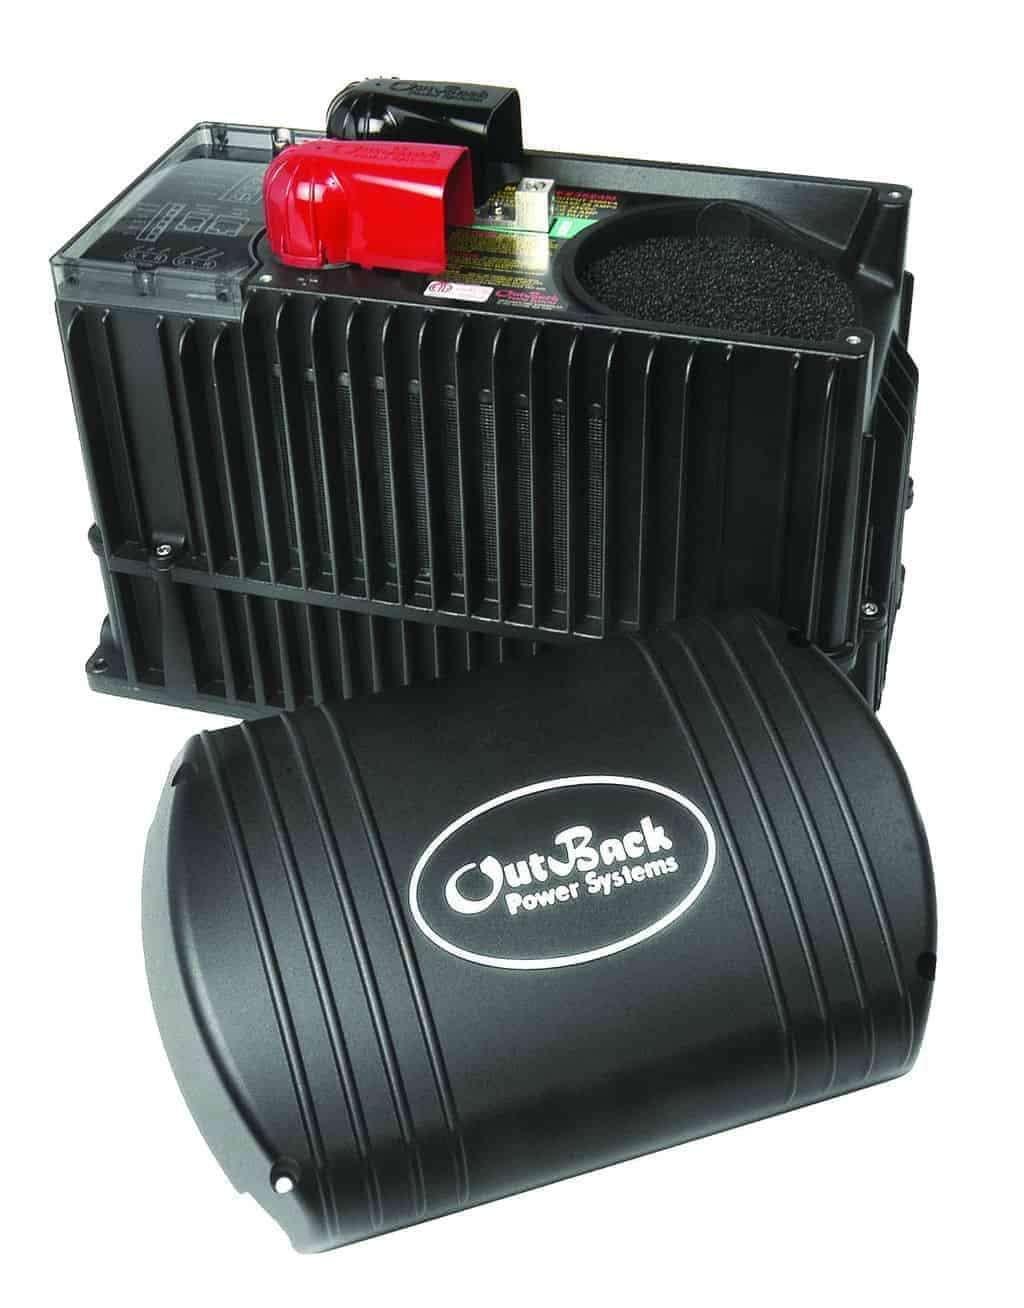 Outback Power VFXR3648A-01 Inverter